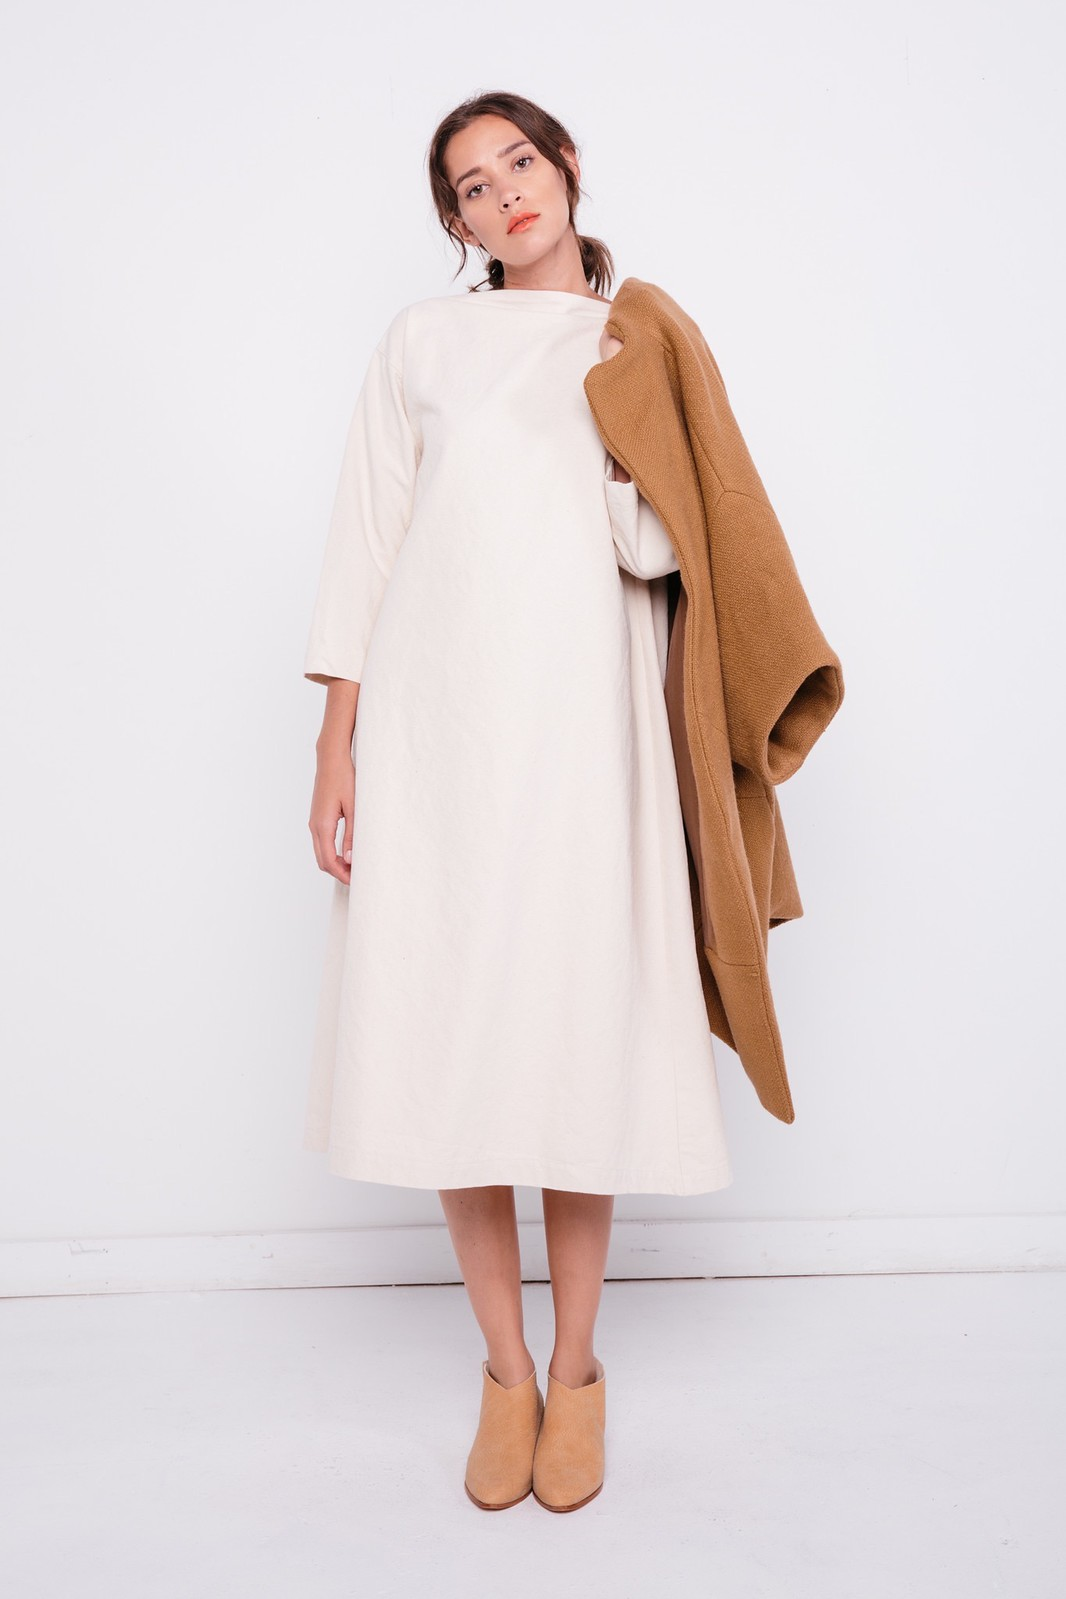 05-elizabeth-suzann-product-cocoon-coat-camel-heavy-wool